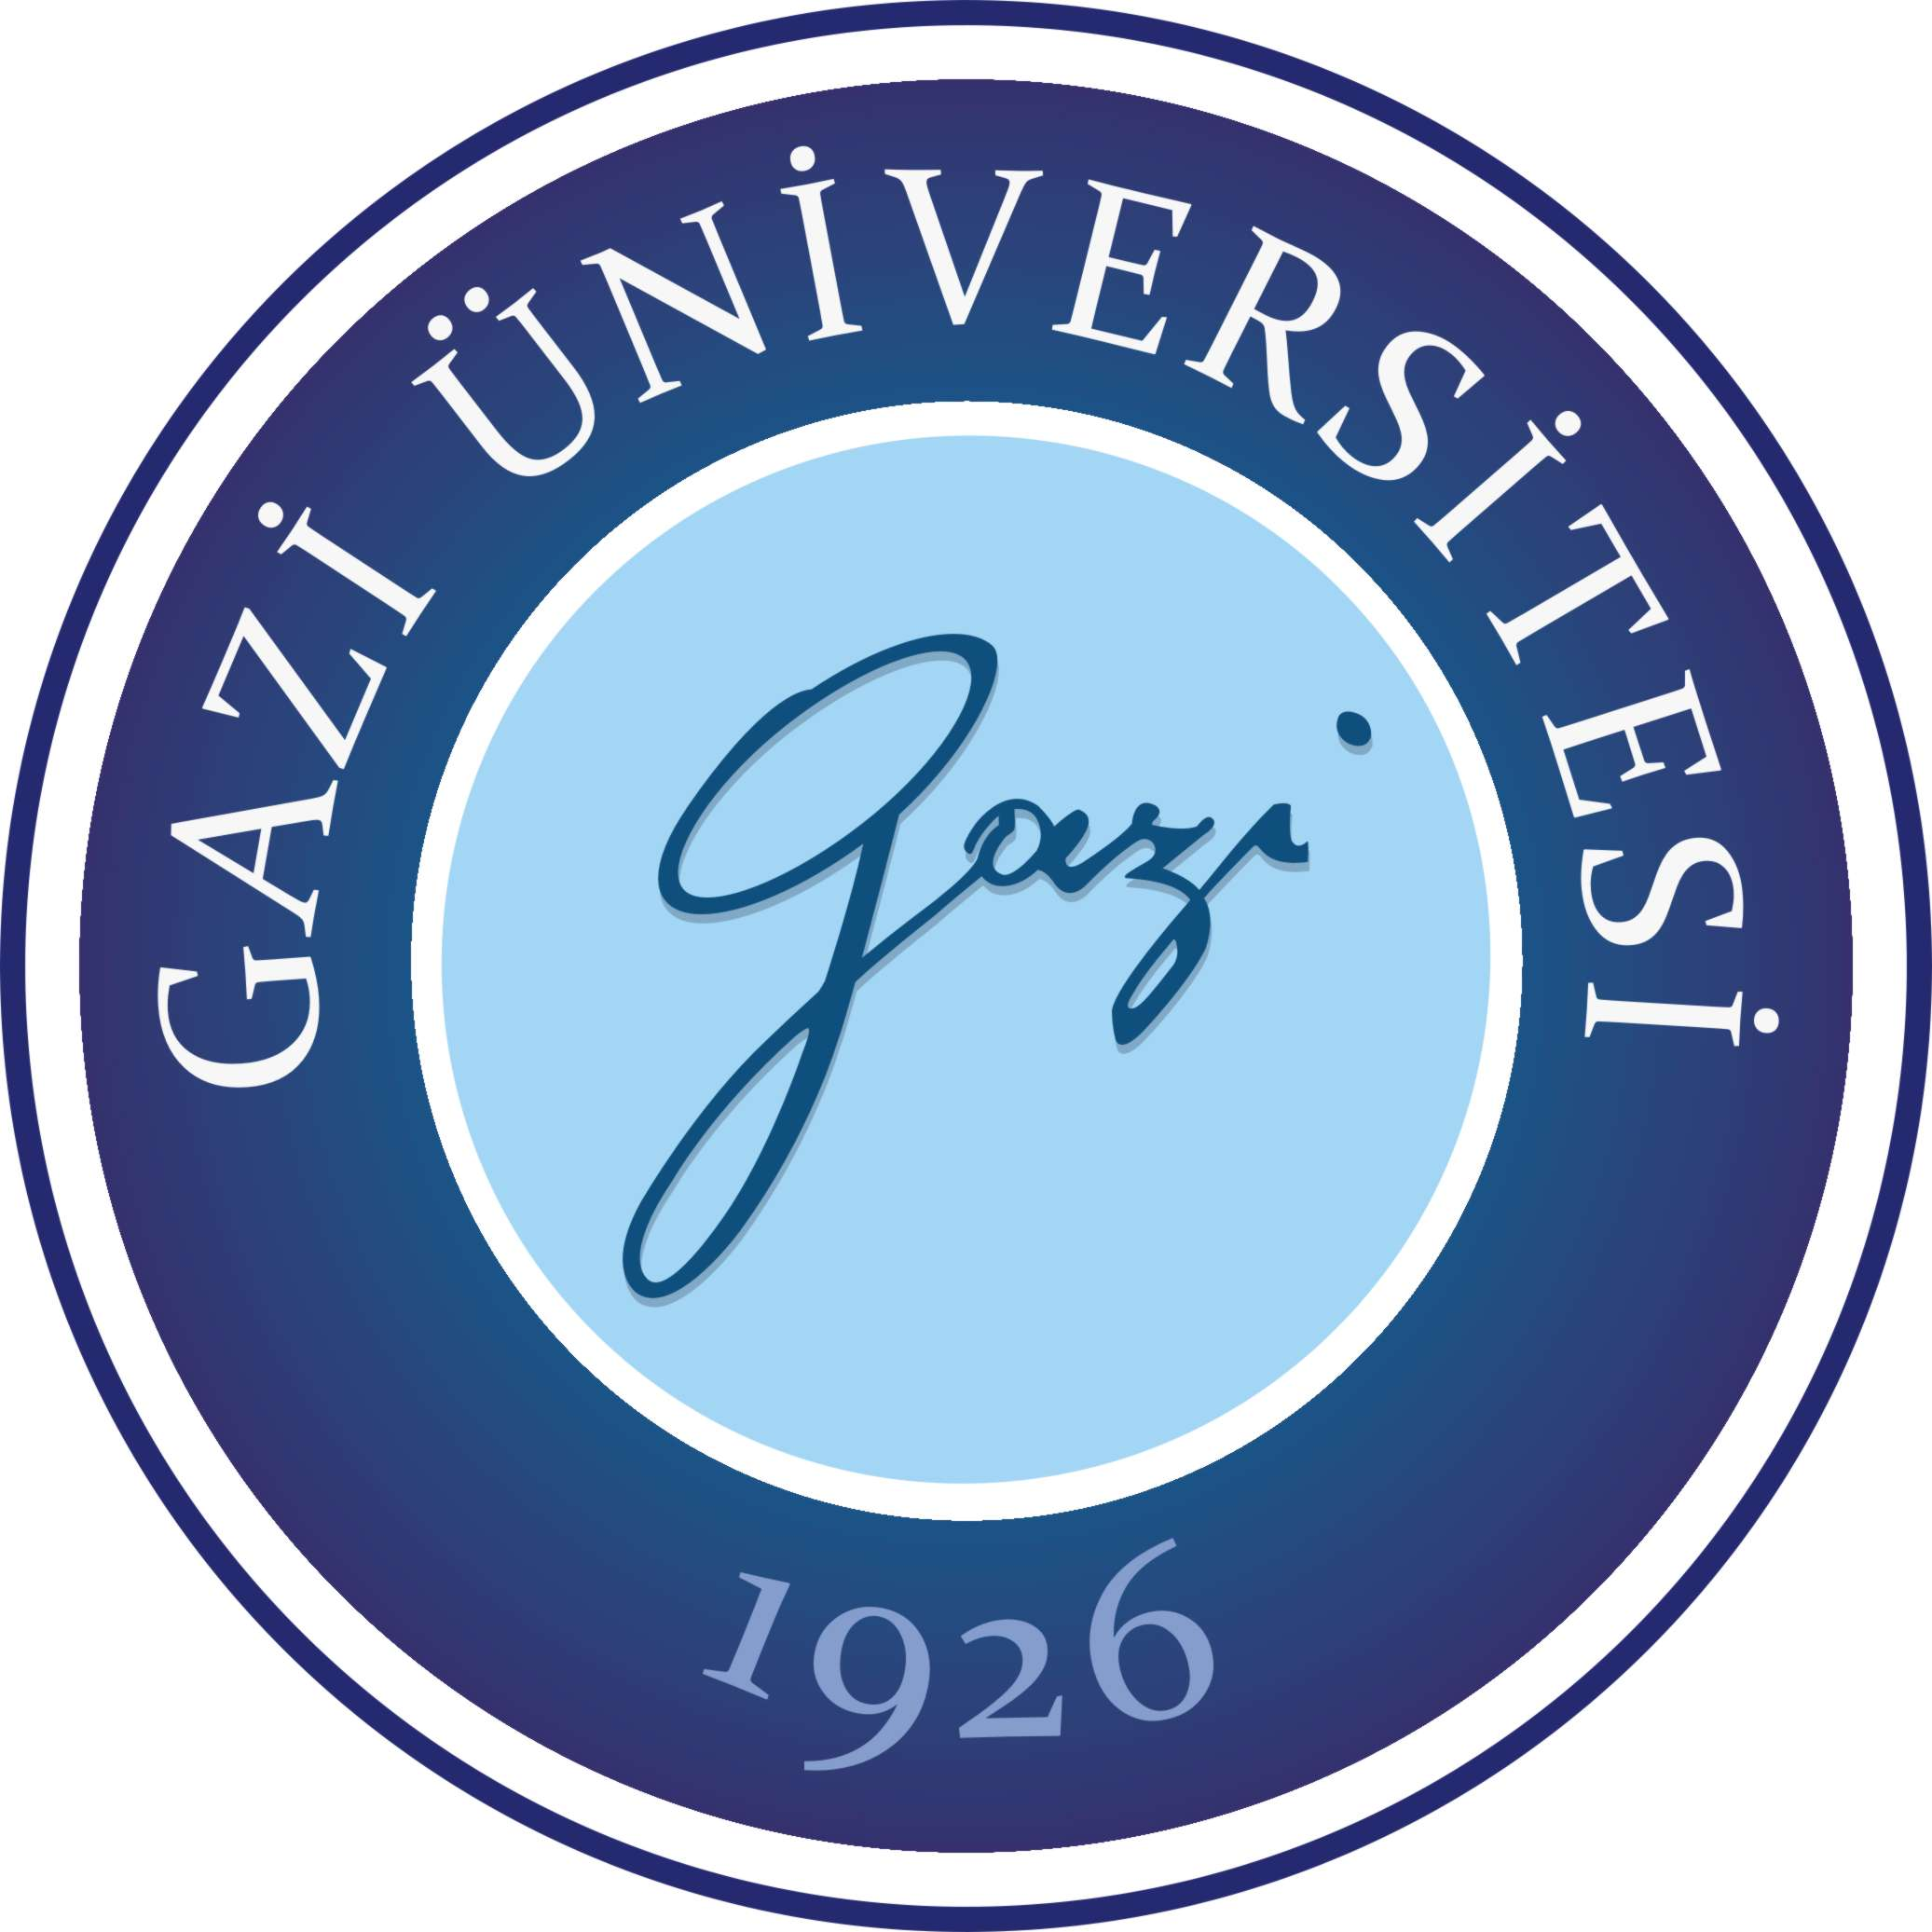 Dosya:Gazi Üniversitesi Logo jpg.jpg - Vikipedi